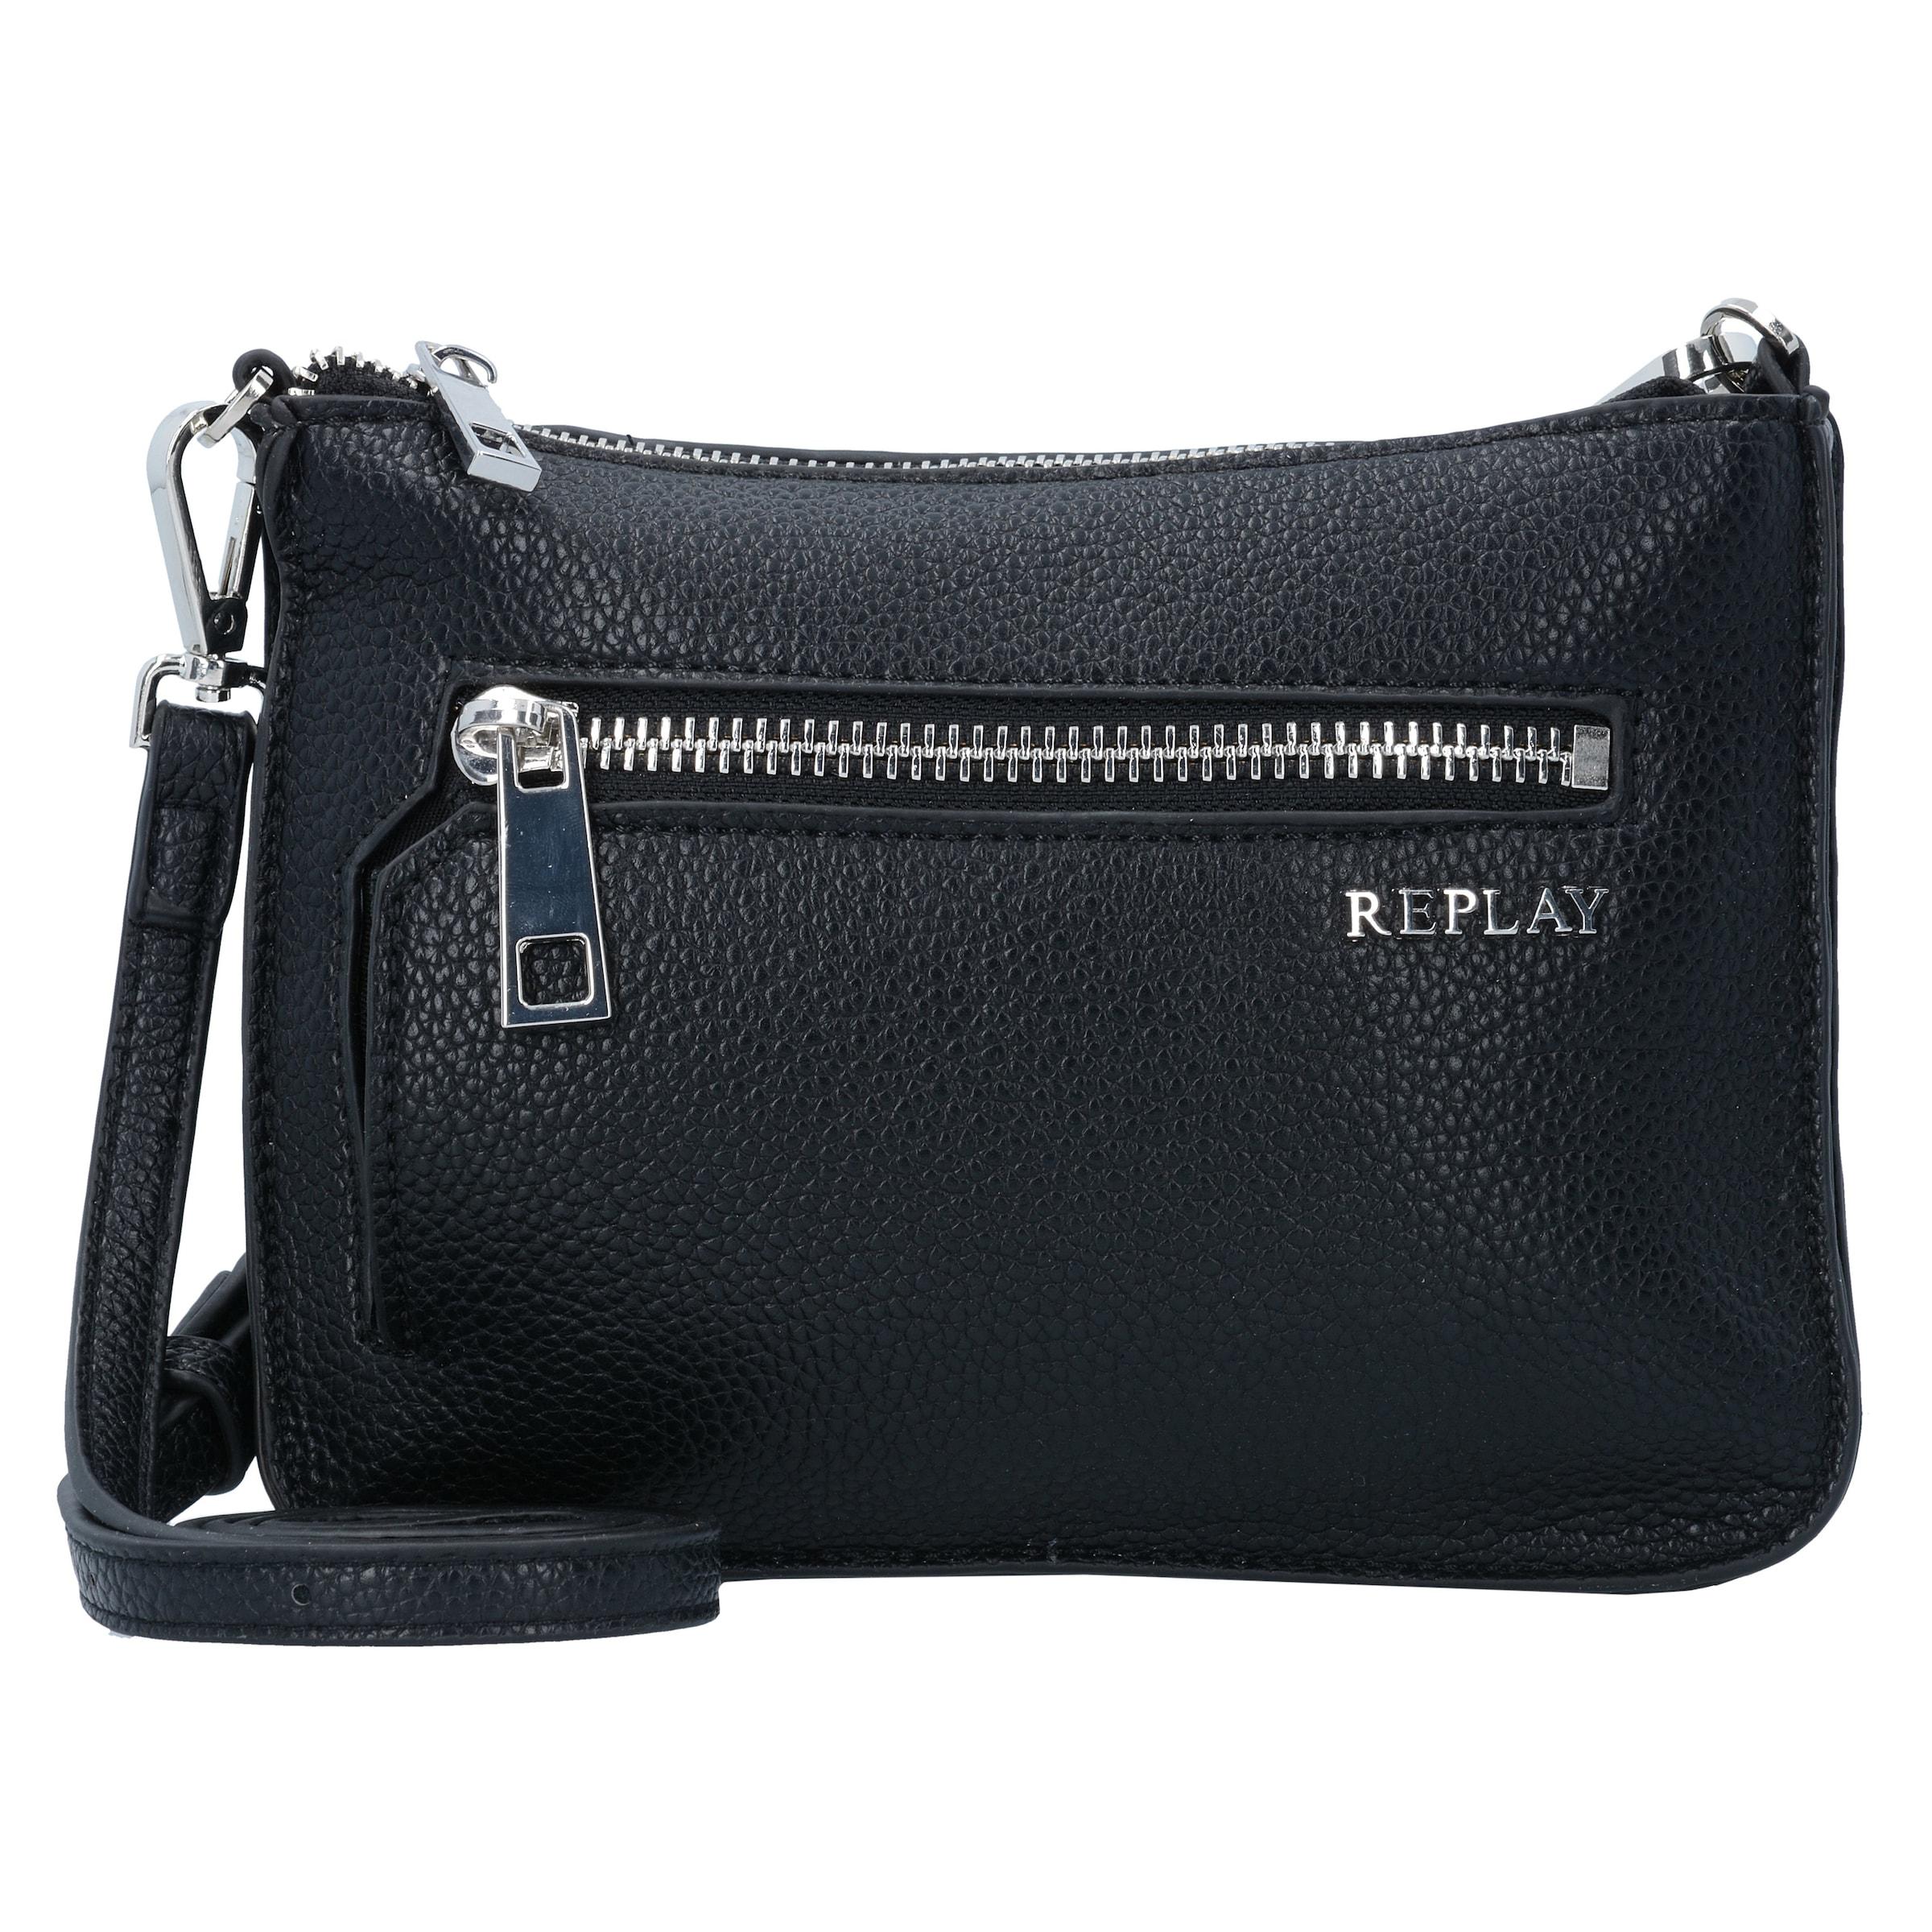 REPLAY Mini Bag Umhängetasche Leder 20 cm Billigshop Super Angebote Mit Mastercard Online Billig Zuverlässig RT6ra36gH7